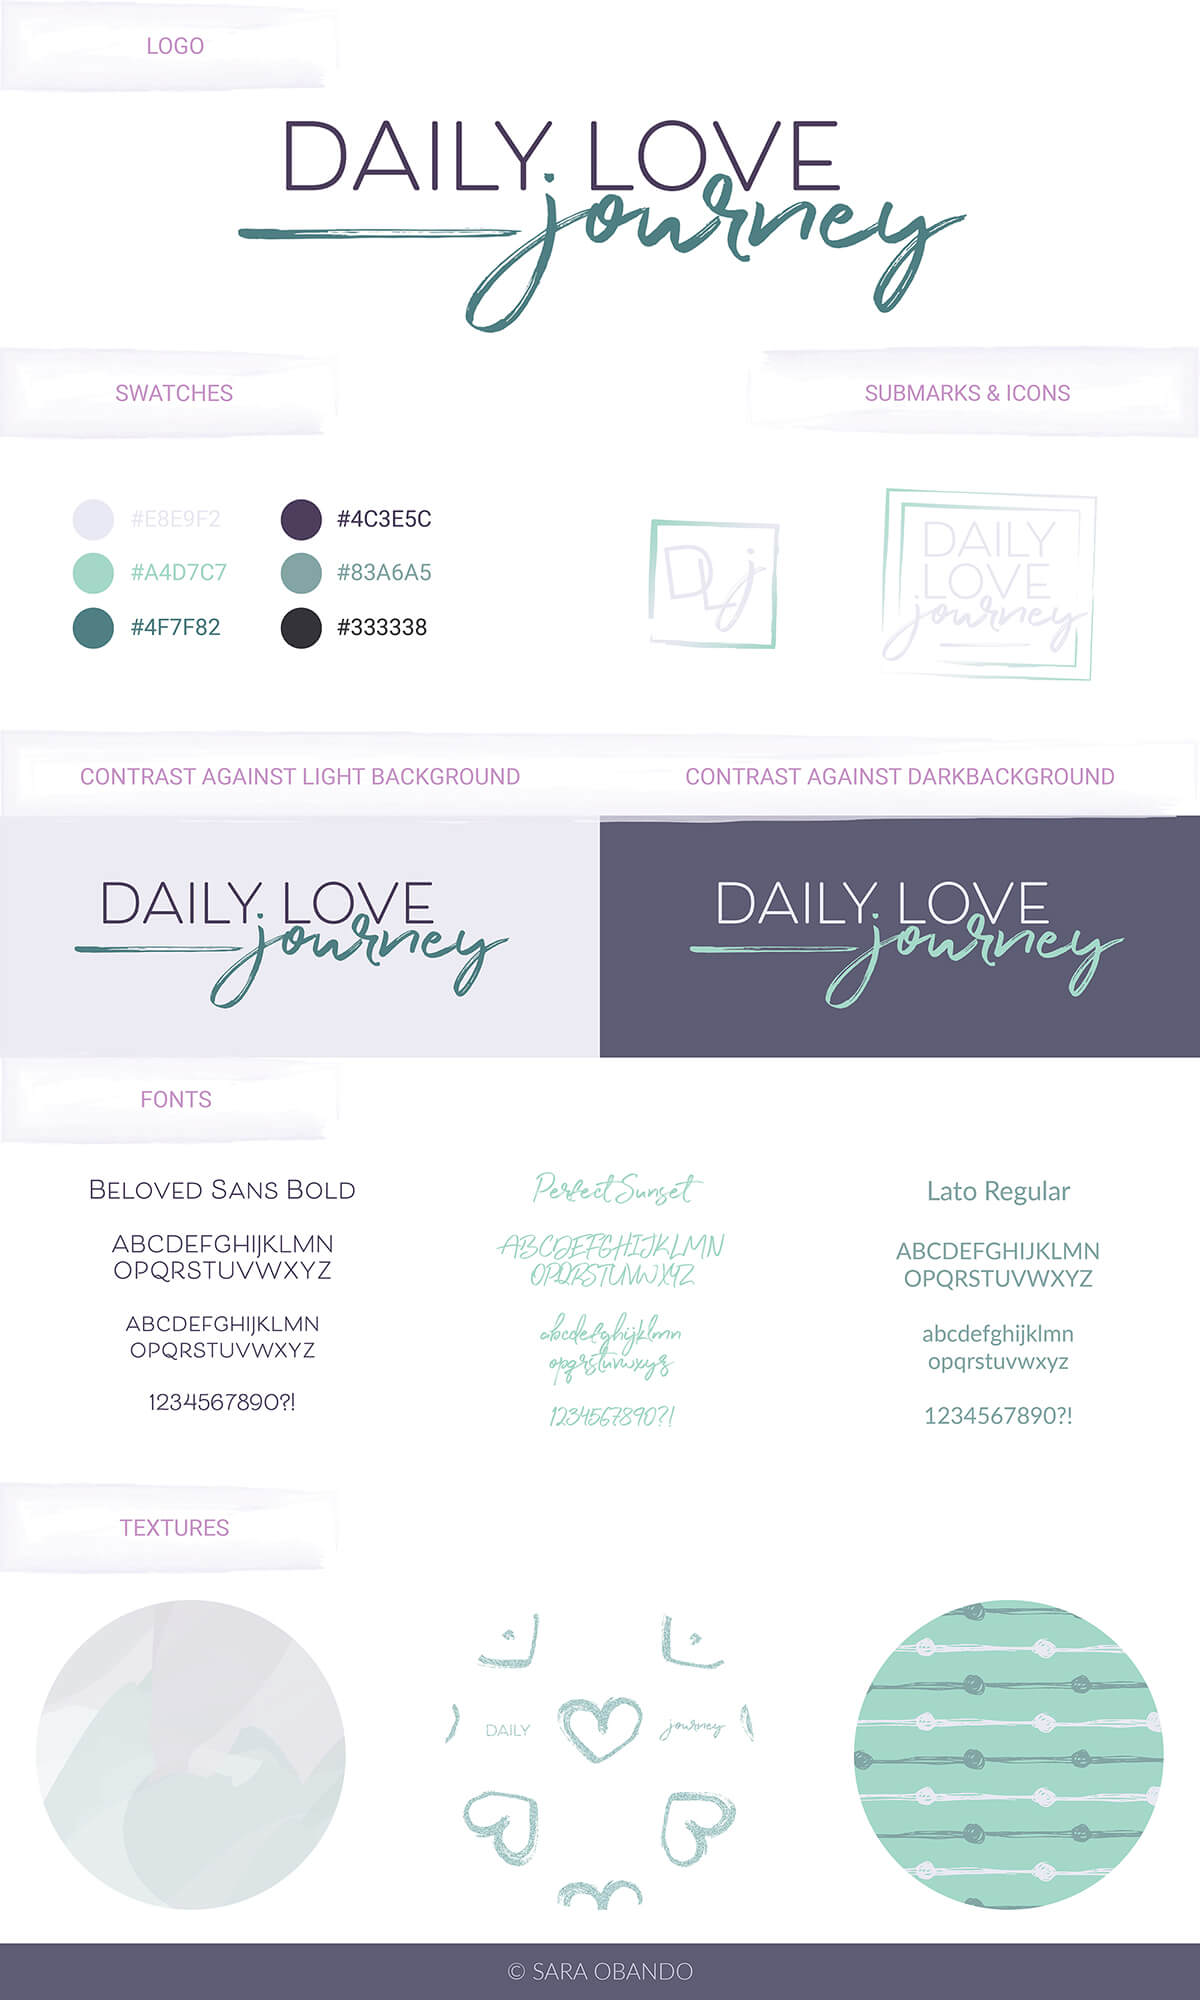 Daily Love Journey Brandboard